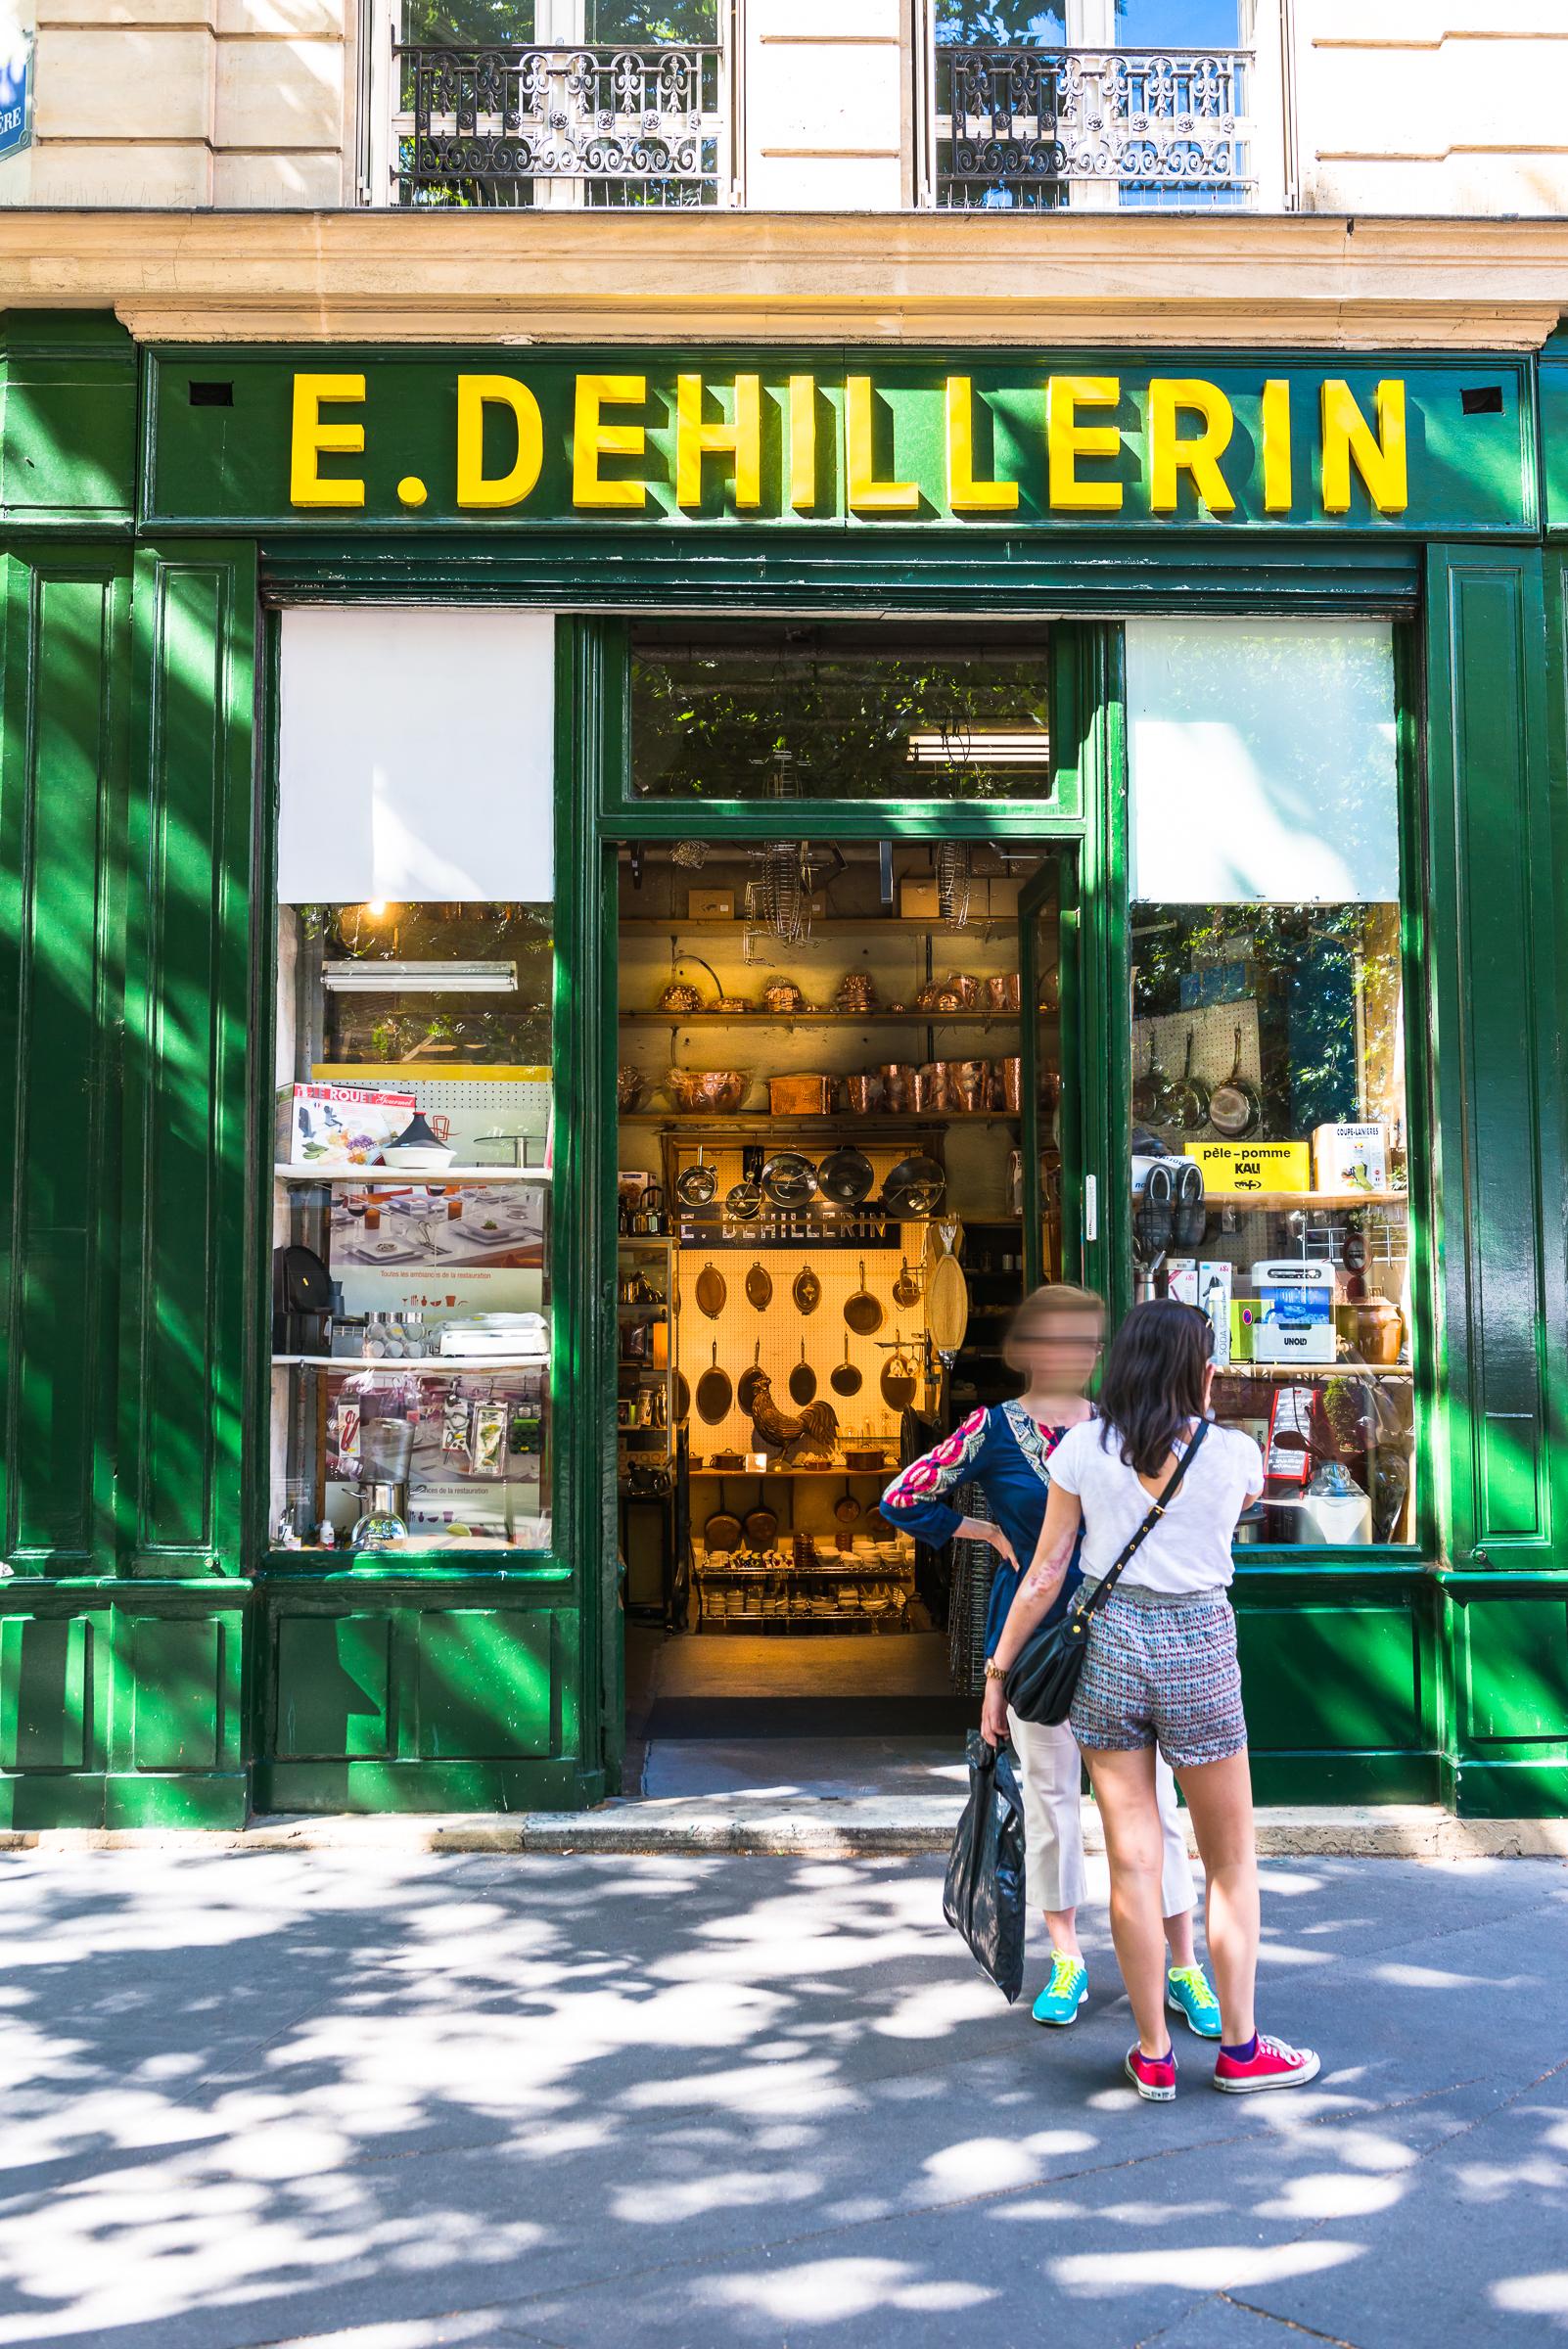 Dehillerin Paris 1er